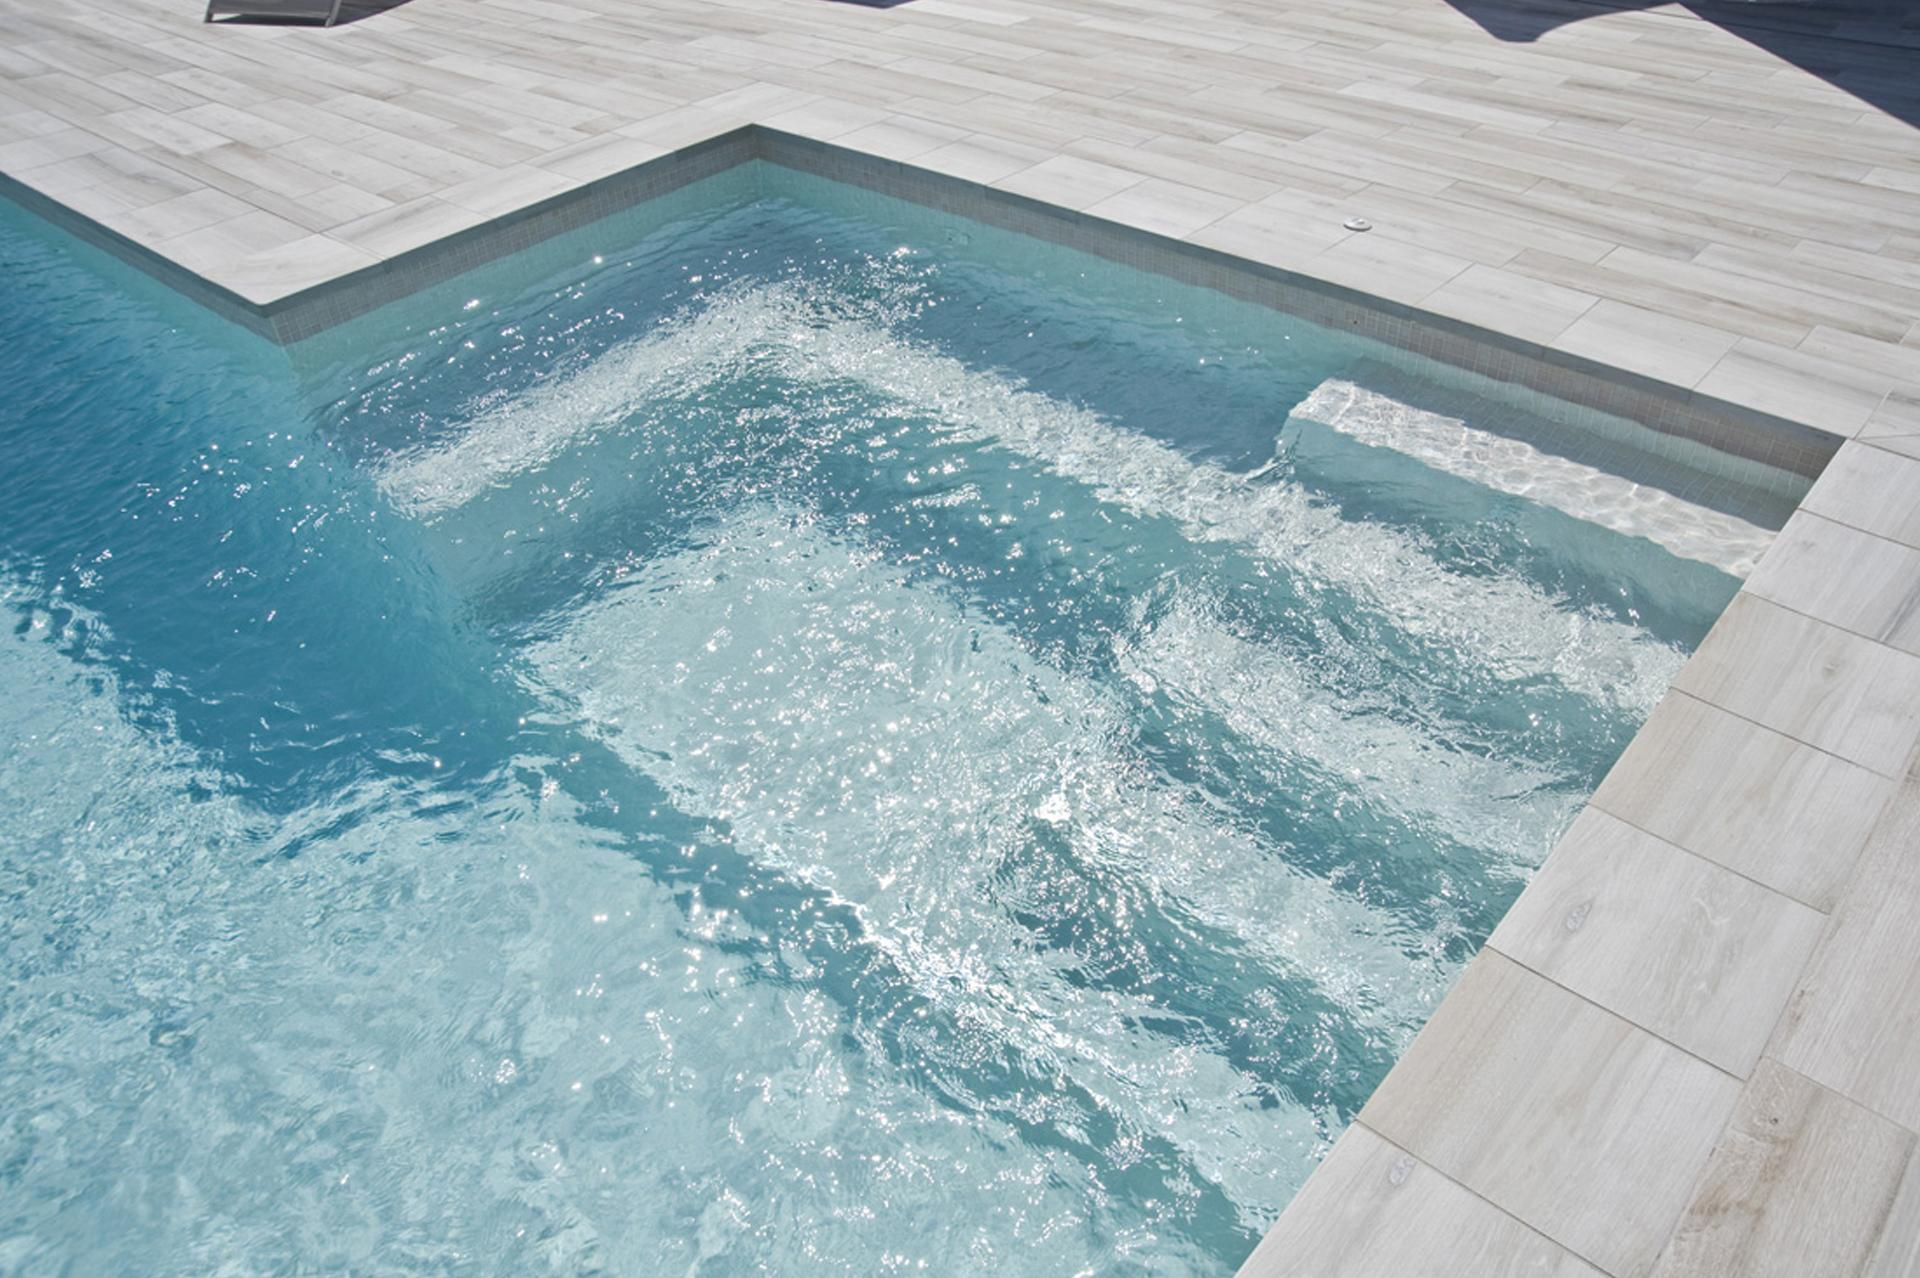 reforma_piscina_2_2